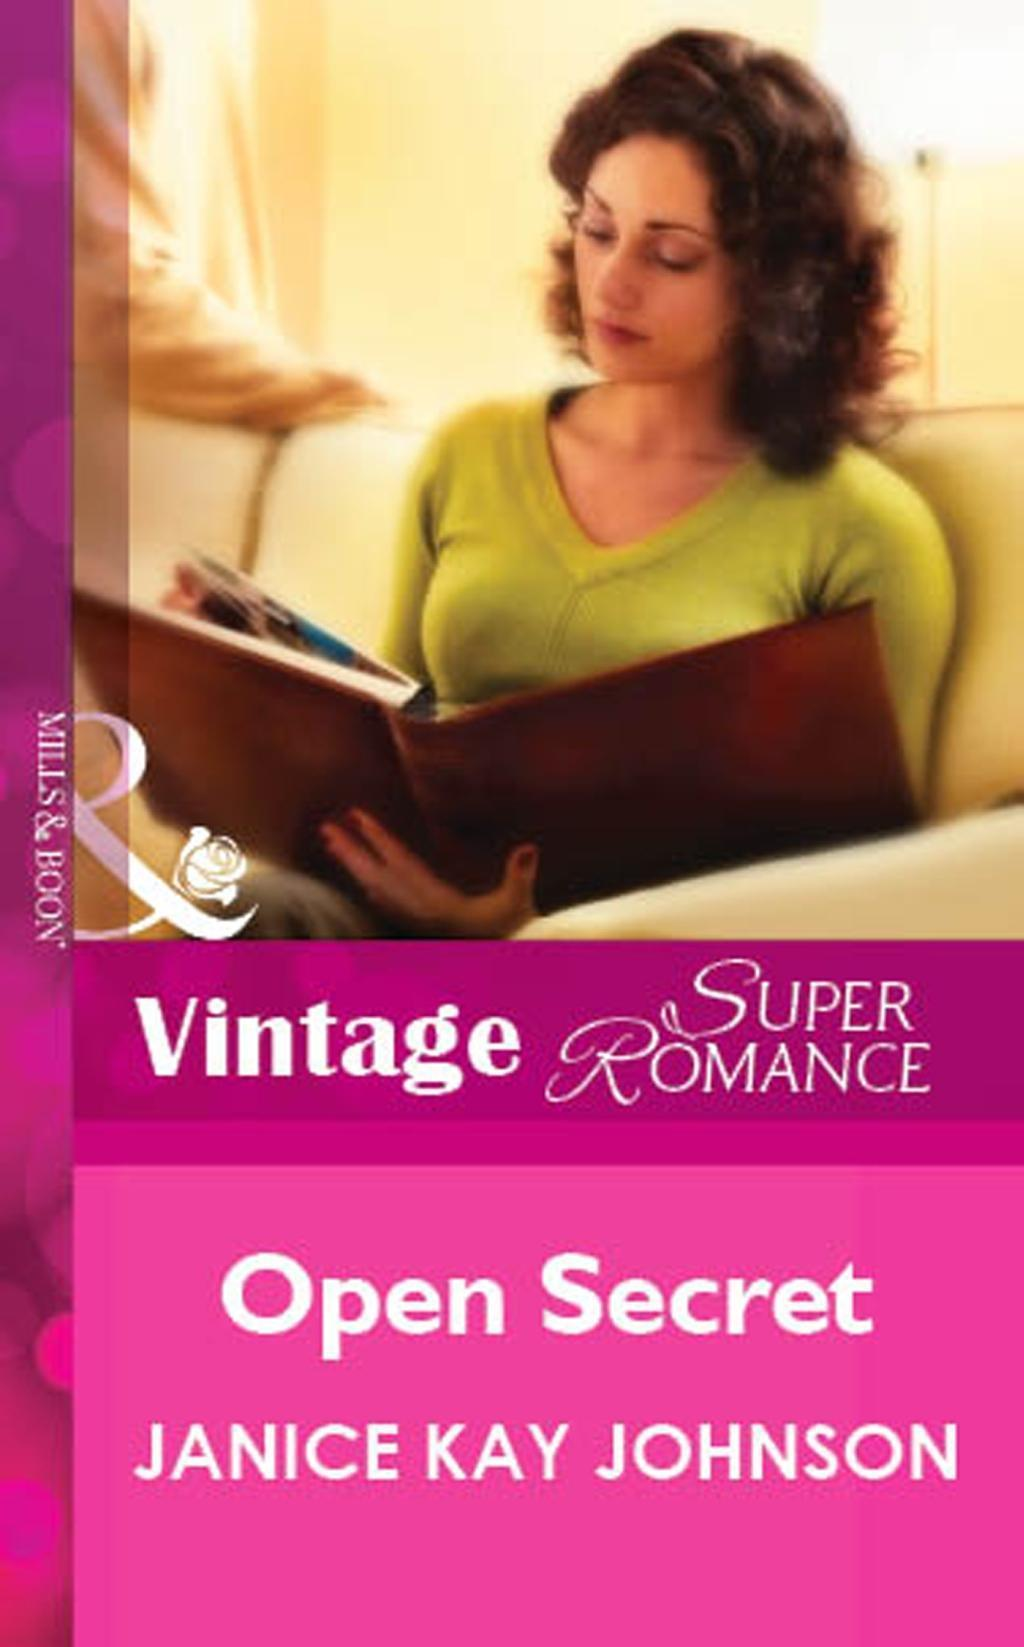 Open Secret (Mills & Boon Vintage Superromance)